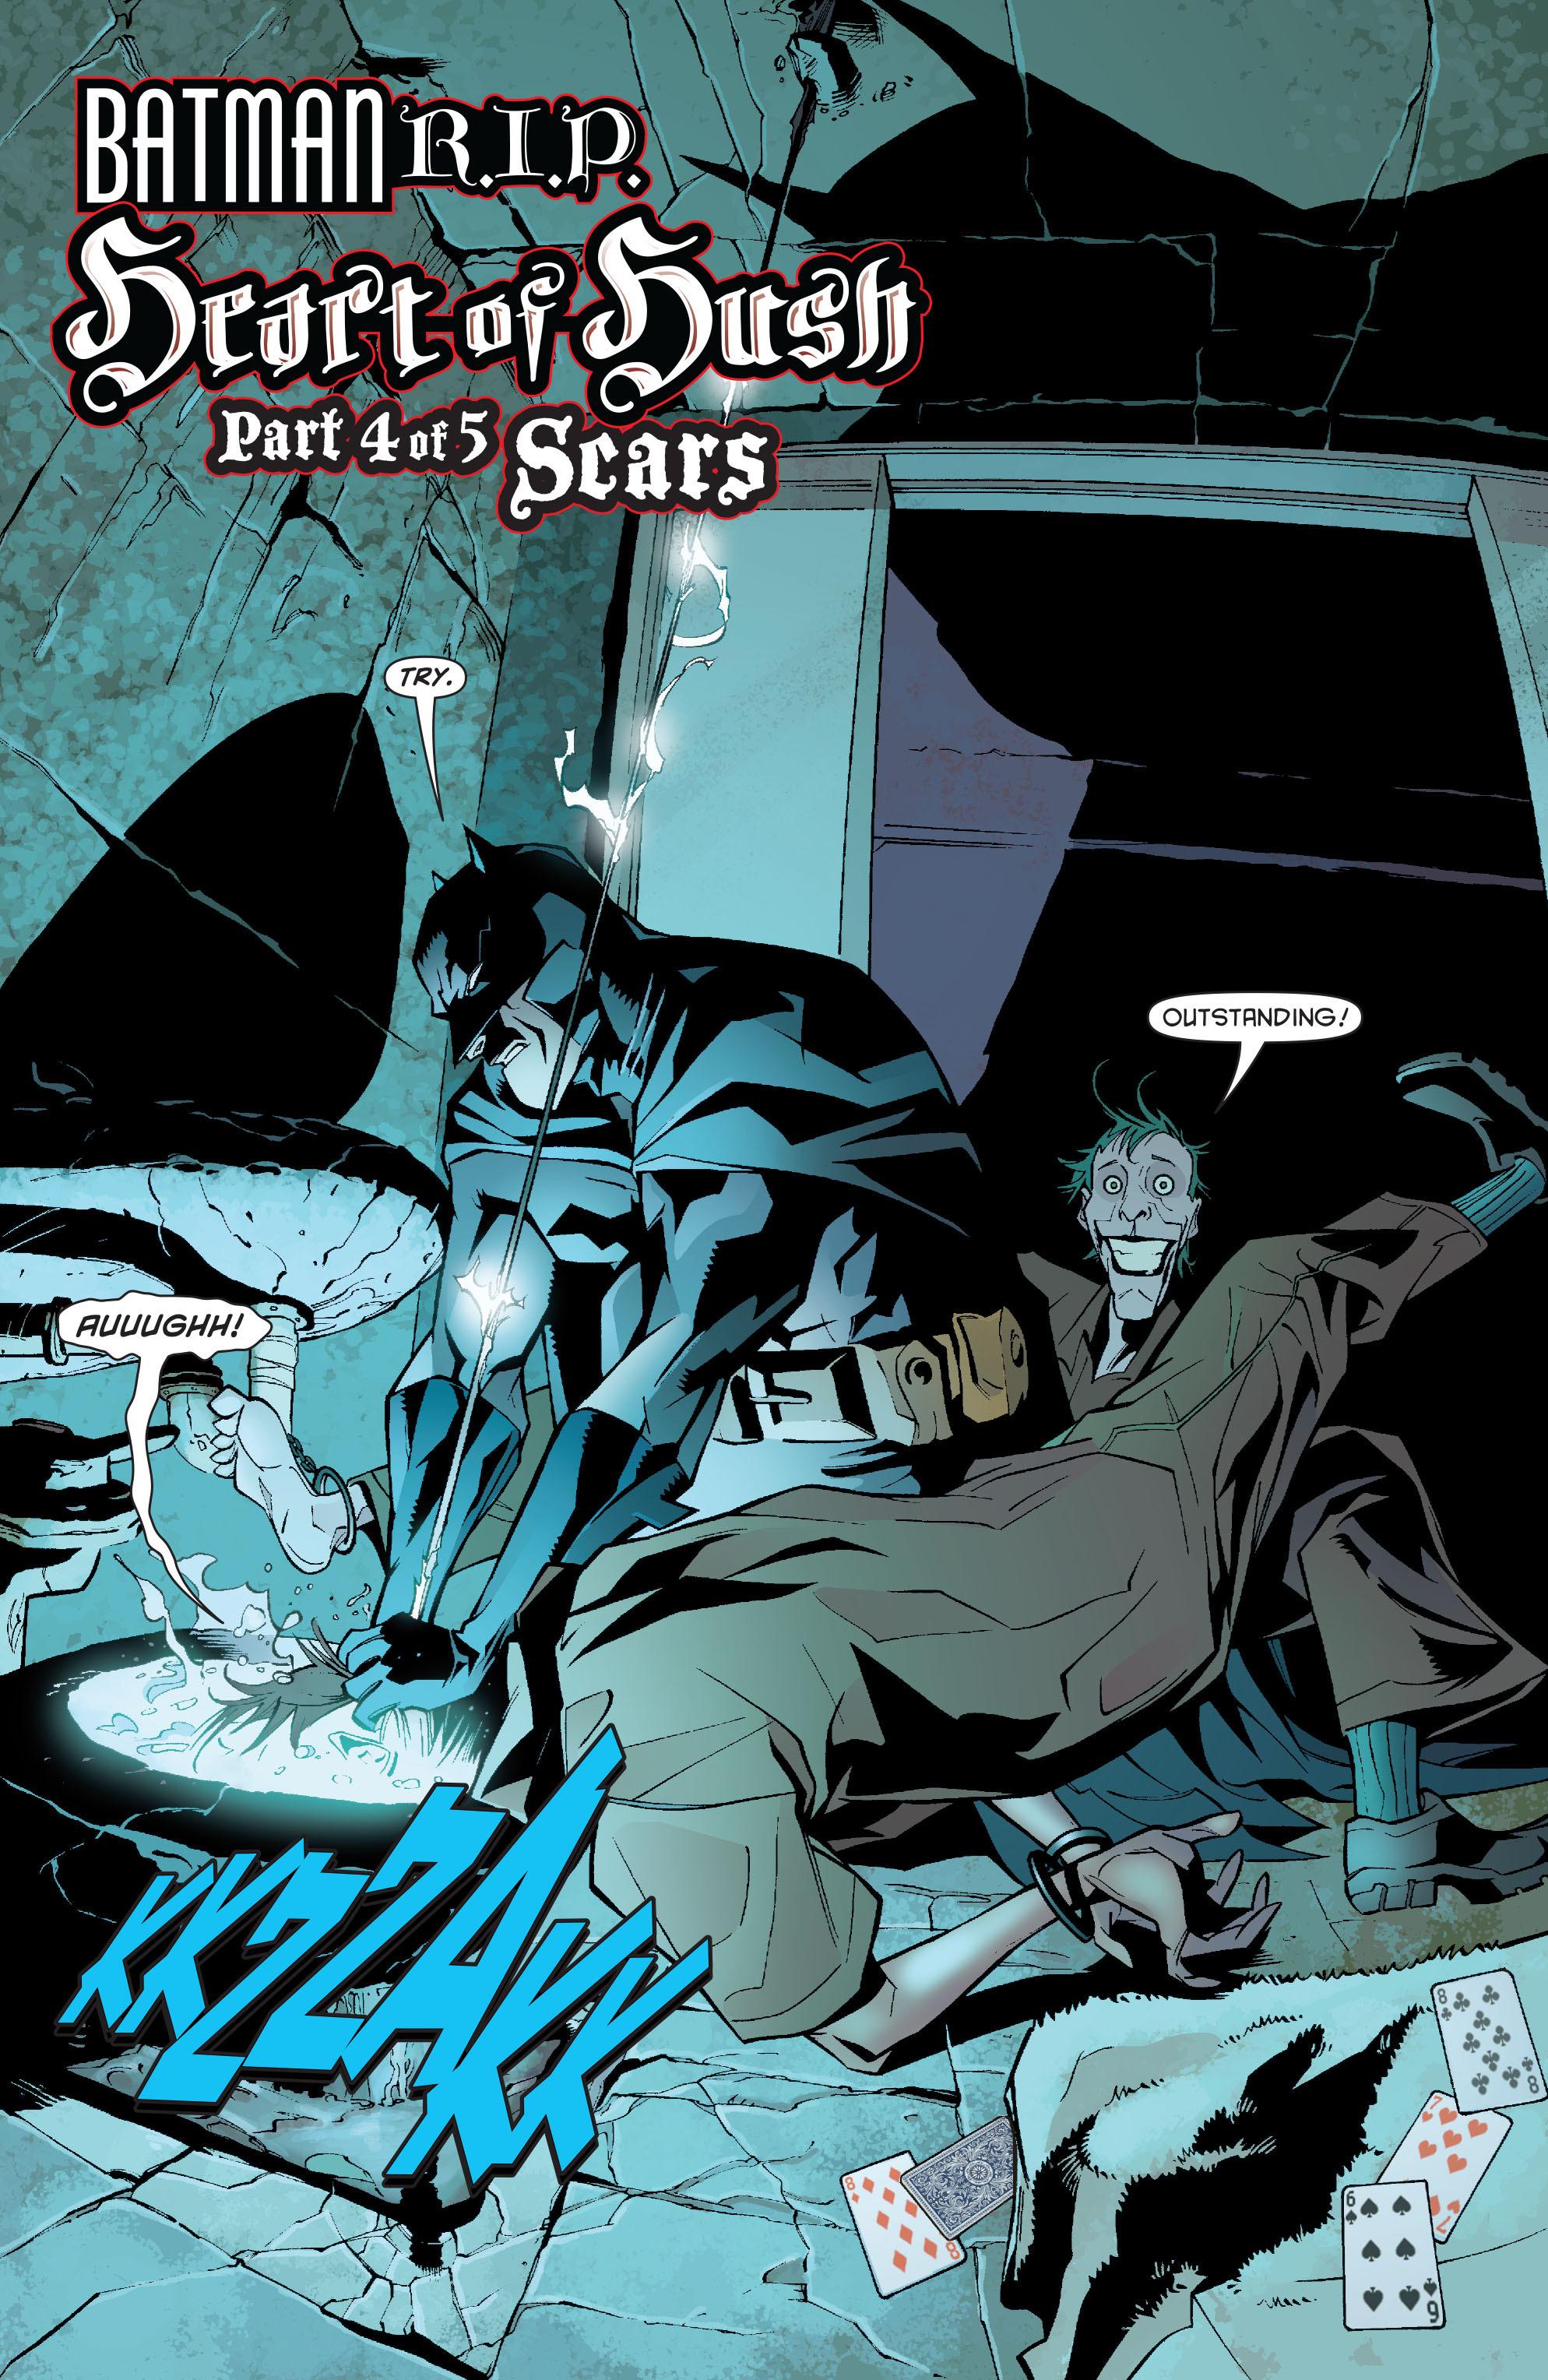 Psychology of Bruce Wayne Y-eiUialOqz2rVUKLTVHB2q7dD-OdOEwB74KwsX2Oo2vkYbI7IUCbhhh2qdr2sXb3Aq5xRMNttcVzQnWPXo7OcWctWY9vhcrLtkziyqJLjLsGOnoiIYJ7BzE8MNCYN7Ou7sH2w=s0